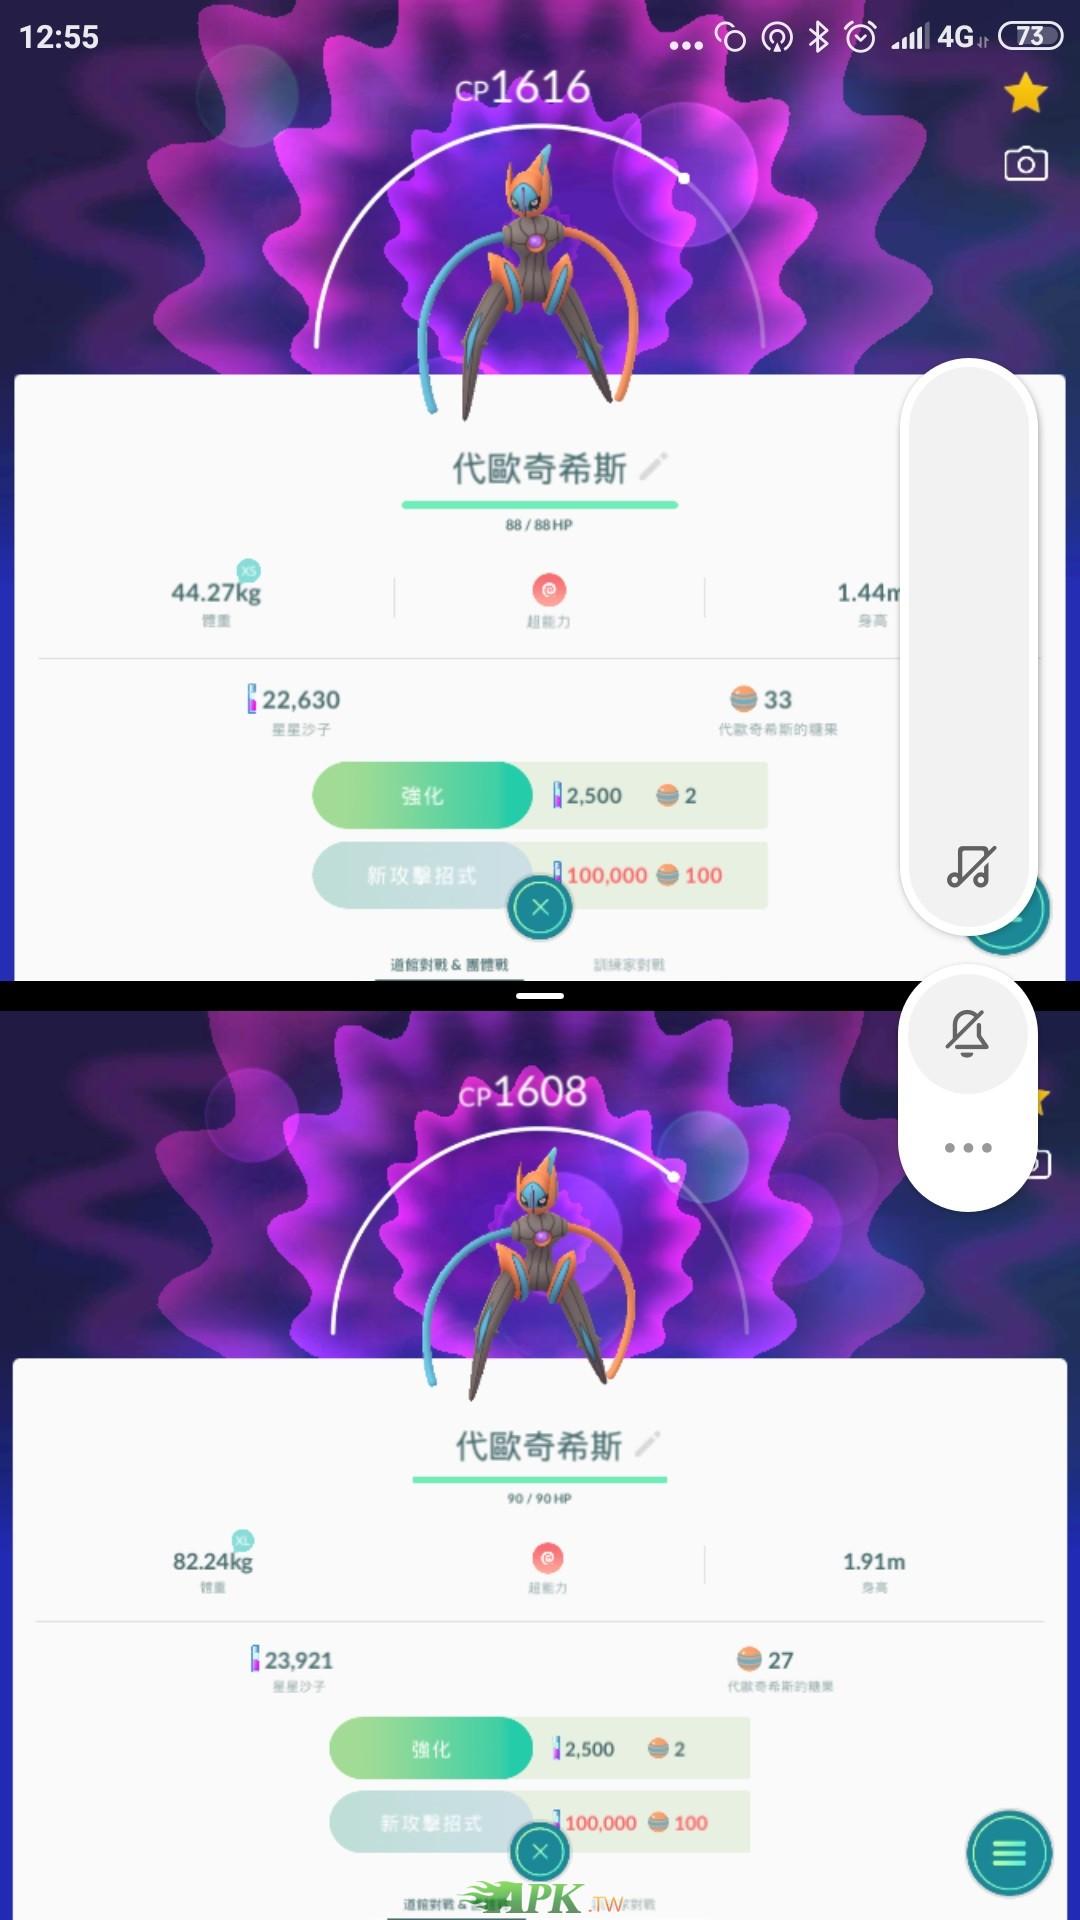 Screenshot_2019-07-02-12-55-47-837_com.nianticlabs.pokemongo.jpg